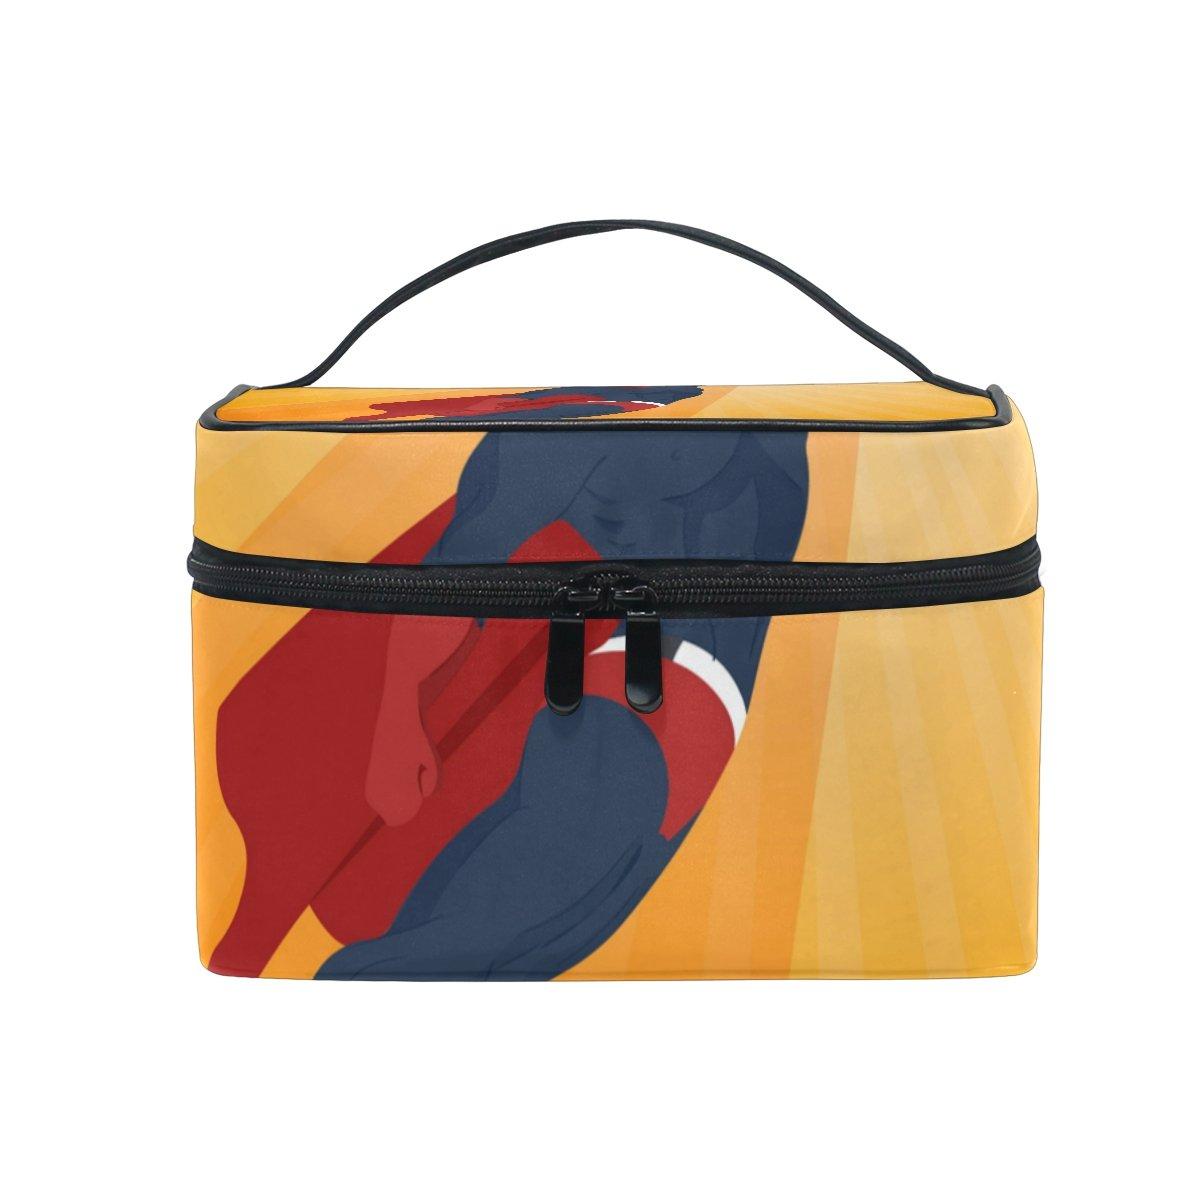 OREZI Superhero Travel Makeup Case Cosmetic Bag for Girl Women, Large Capacity and Adjustable Makeup Bags Travel Waterproof Toiletry Bag Accessories Organizer